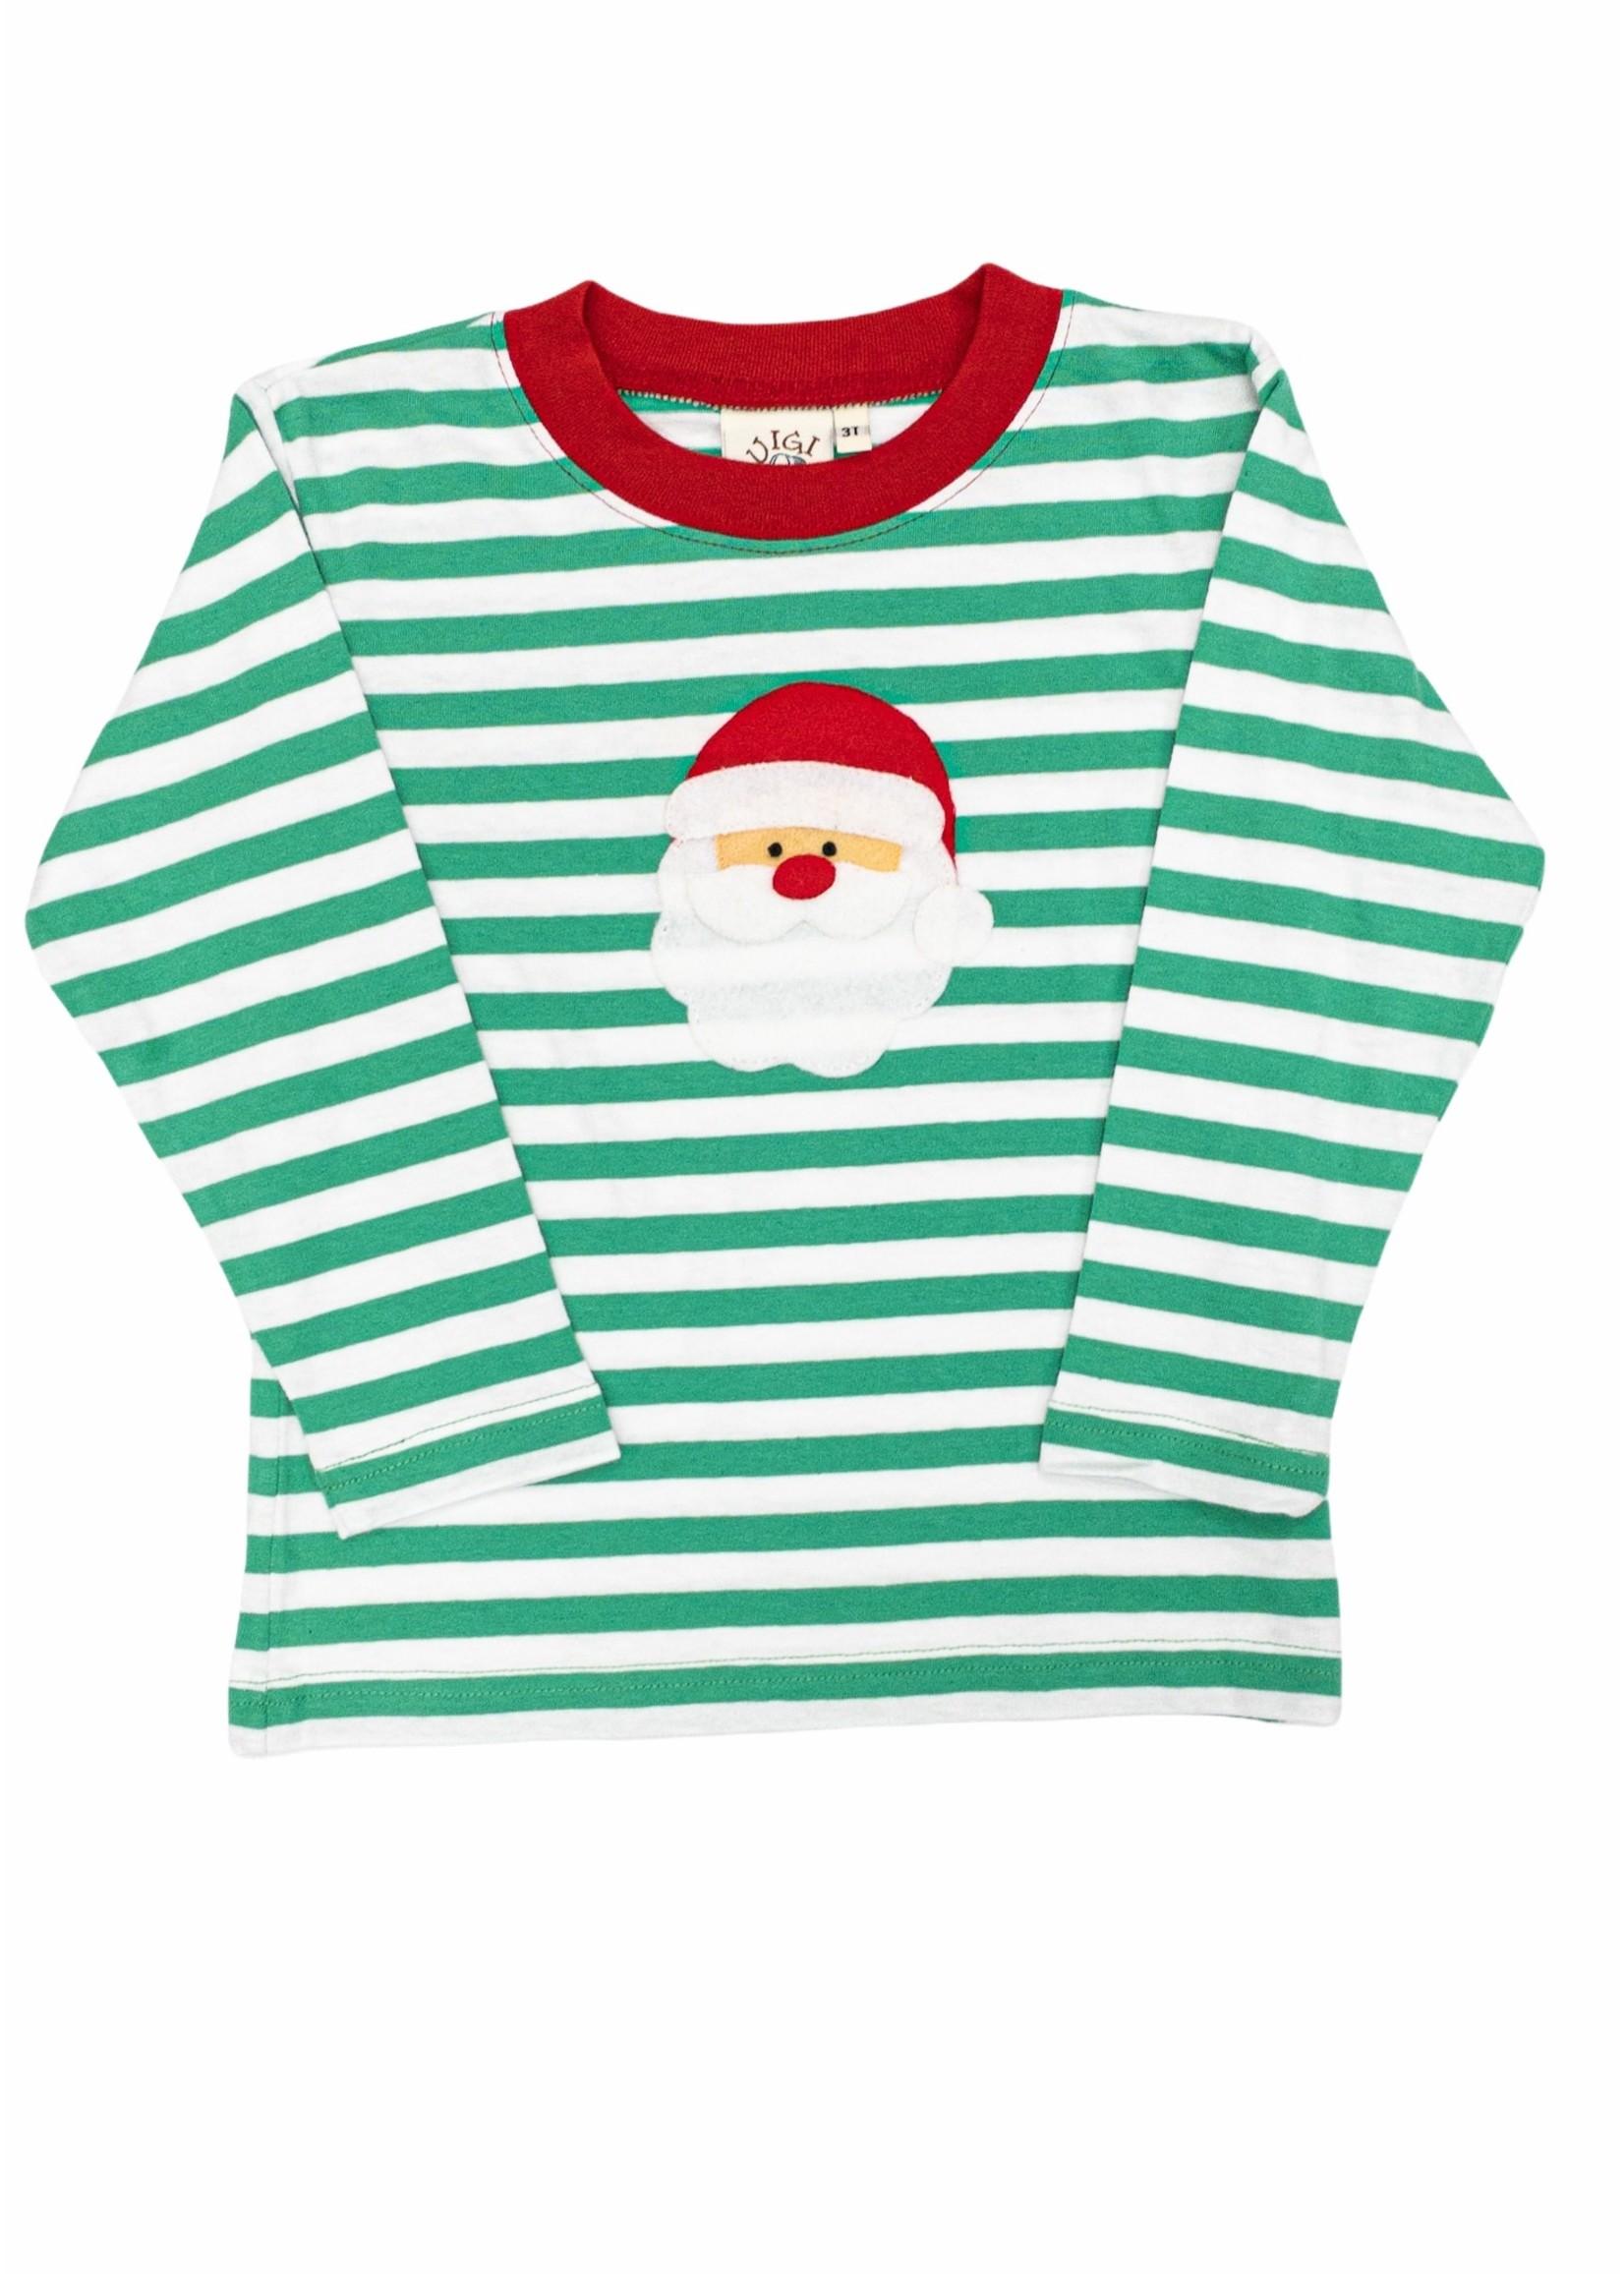 Luigi Holiday Luigi L/S Shirt